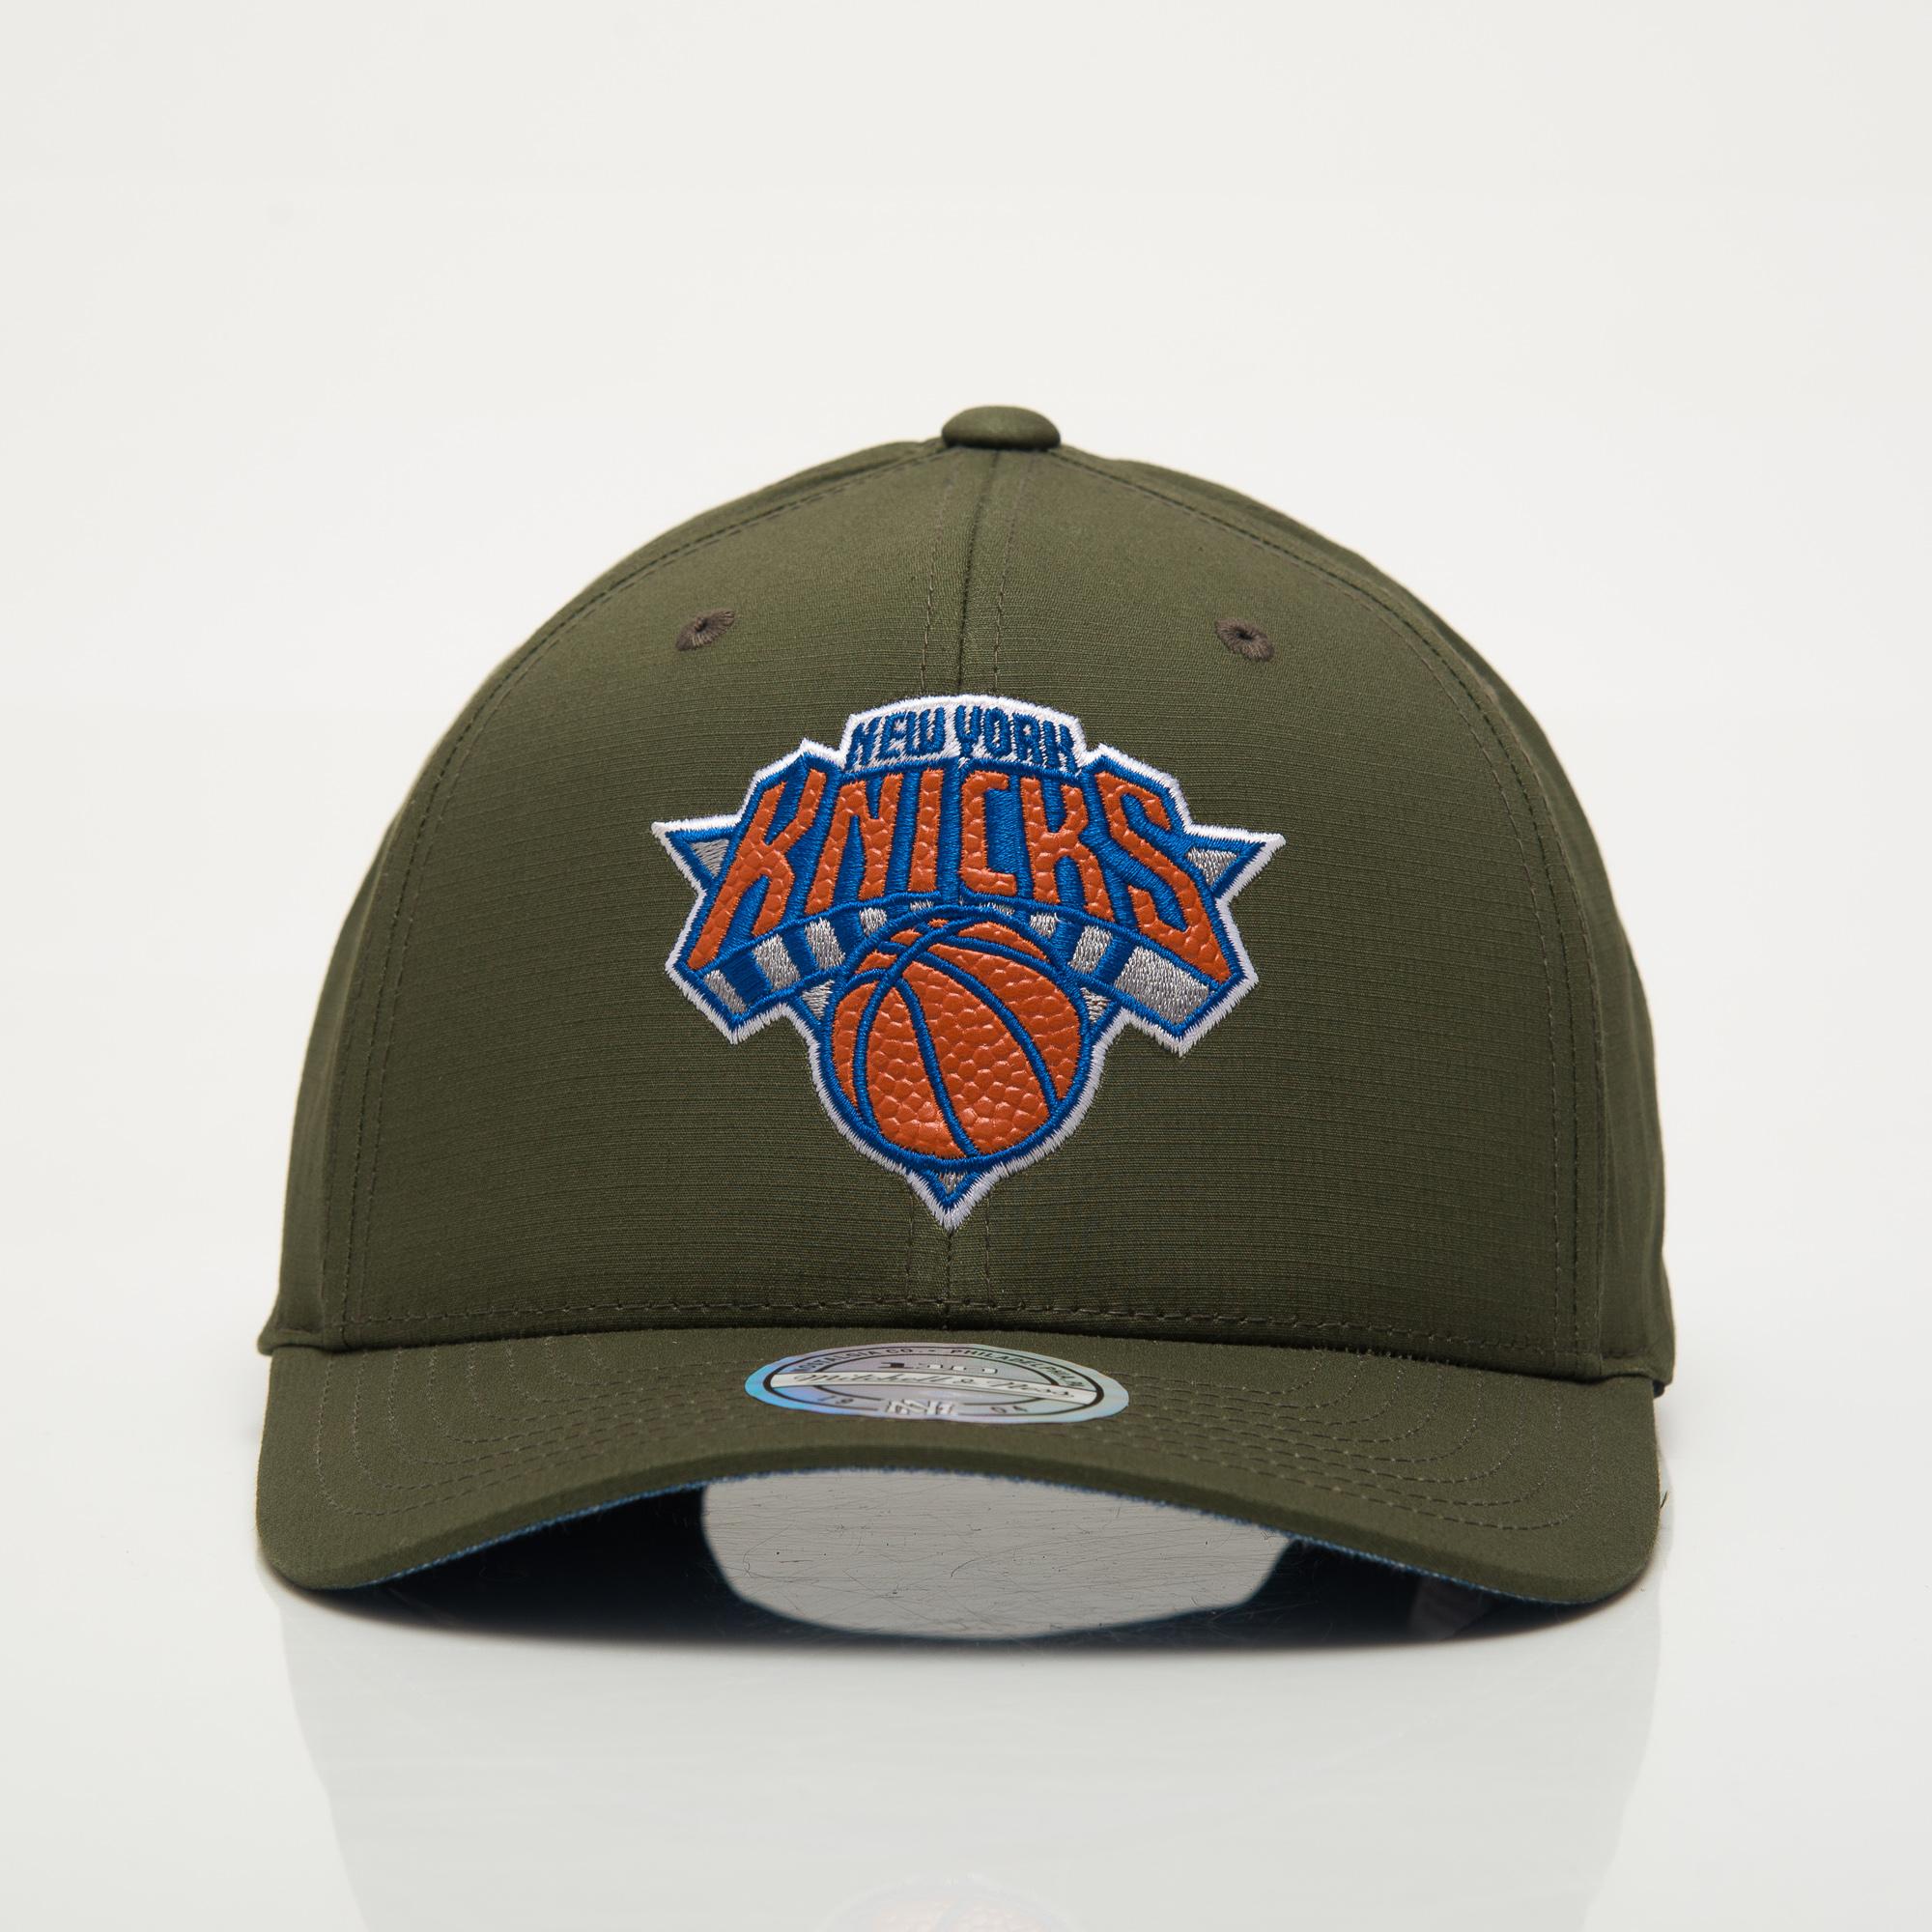 7b3f641c Mitchell & Ness NBA New York Knicks Battle Snapback Cap - NBA Shop ...